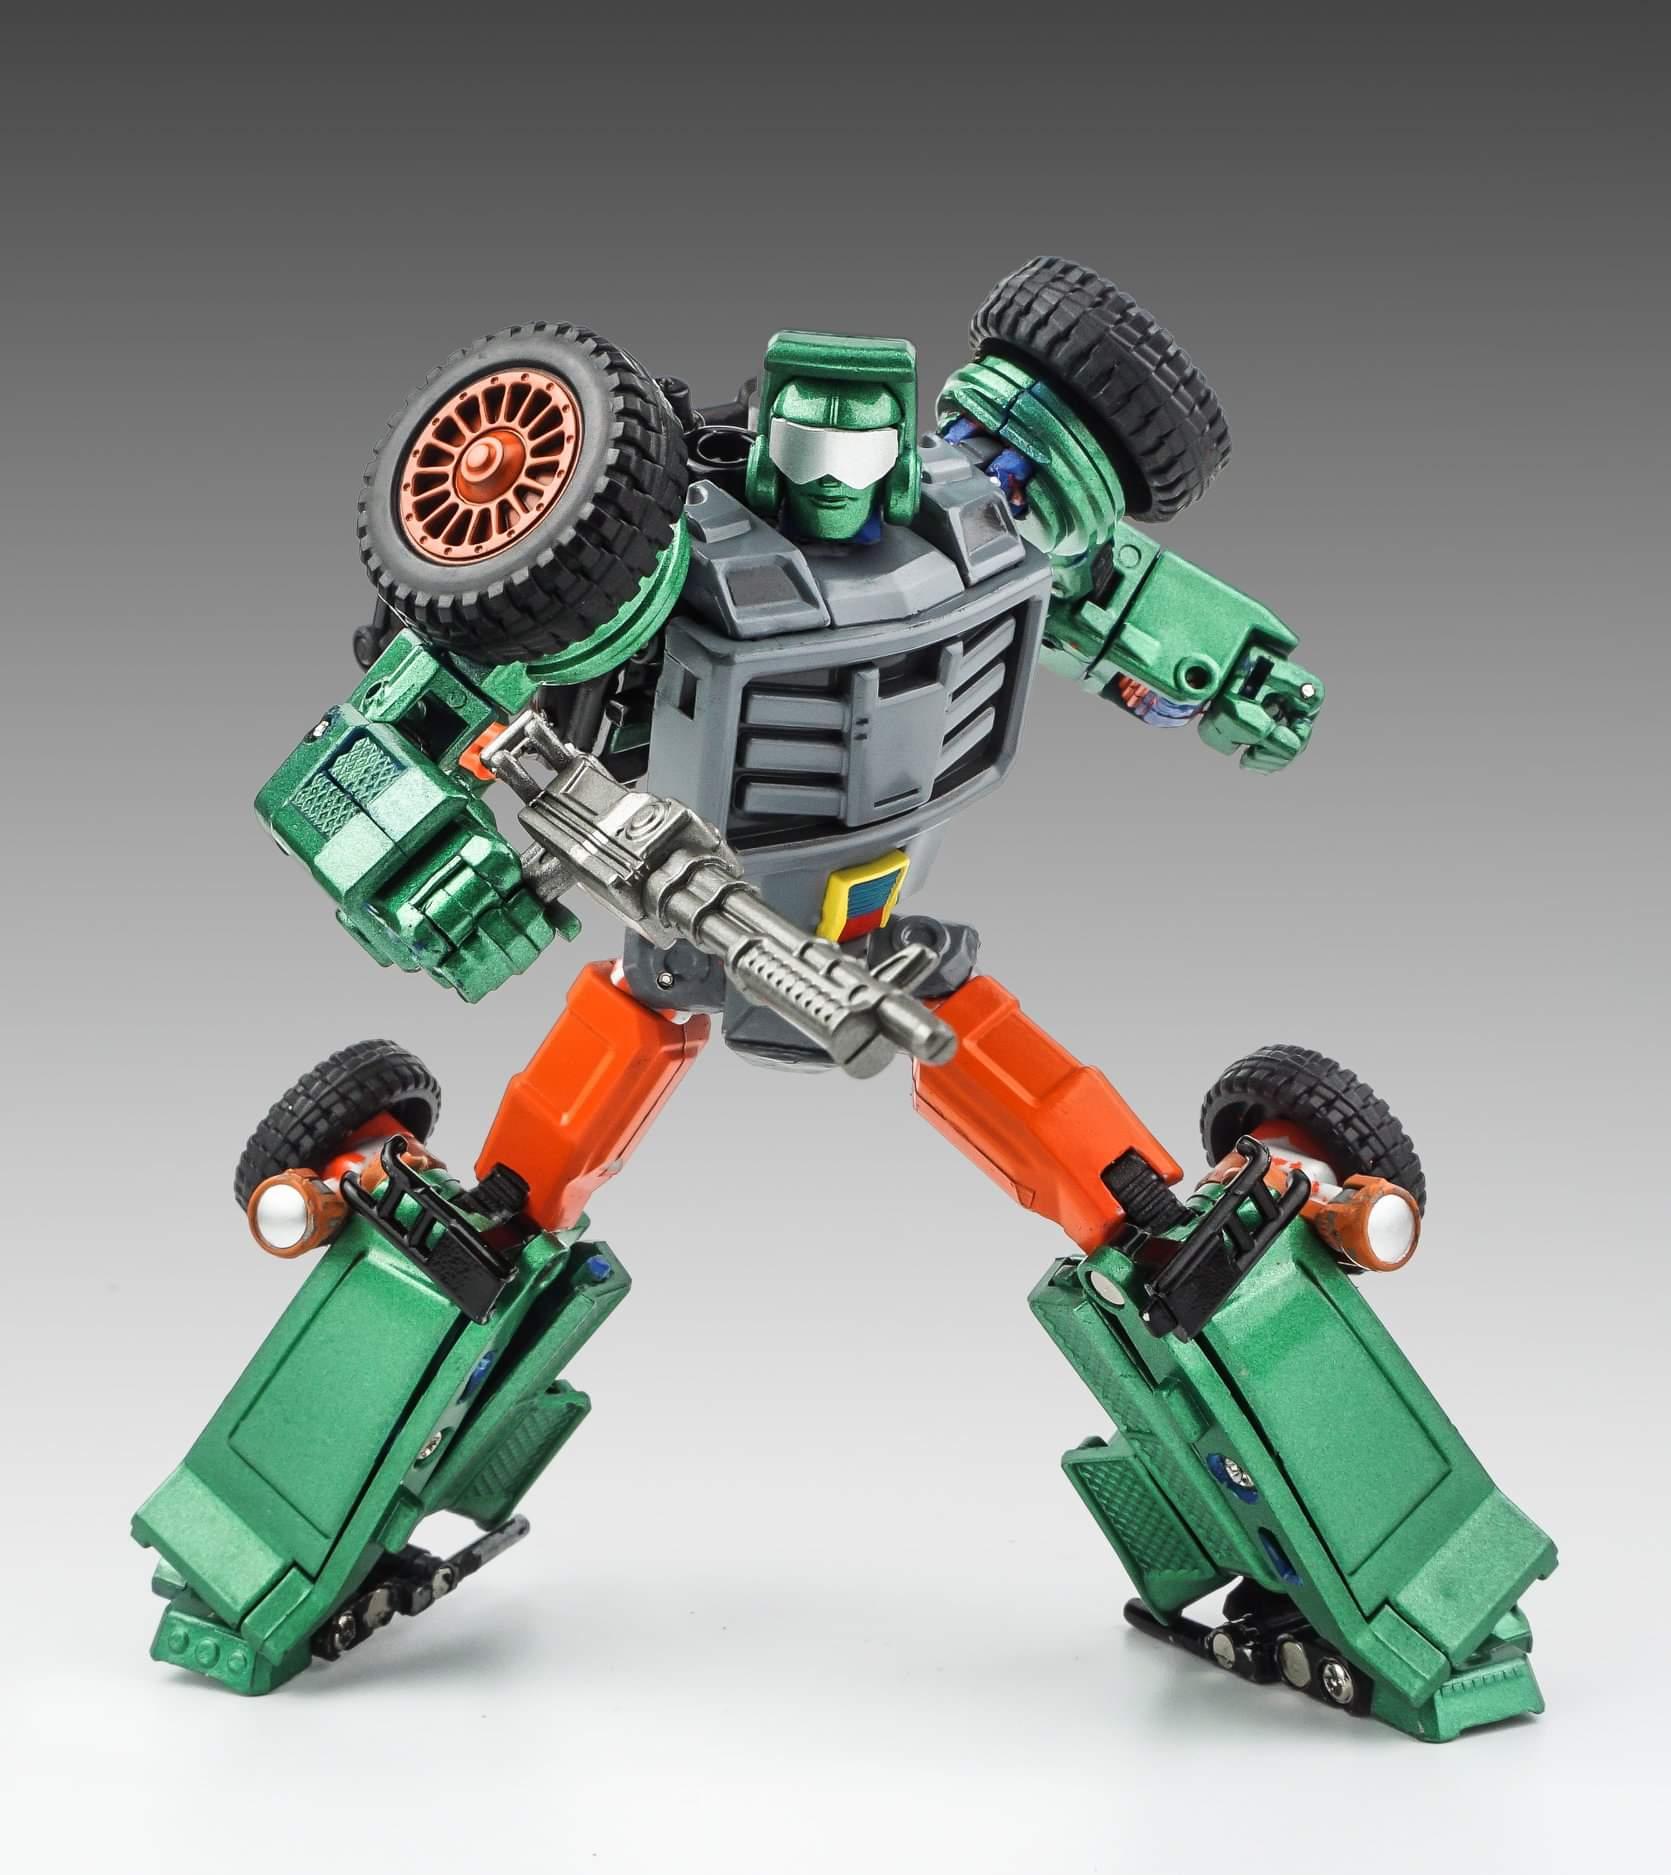 [X-Transbots] Produit Tiers - Minibots MP - Gamme MM - Page 12 JwY5ocA3_o